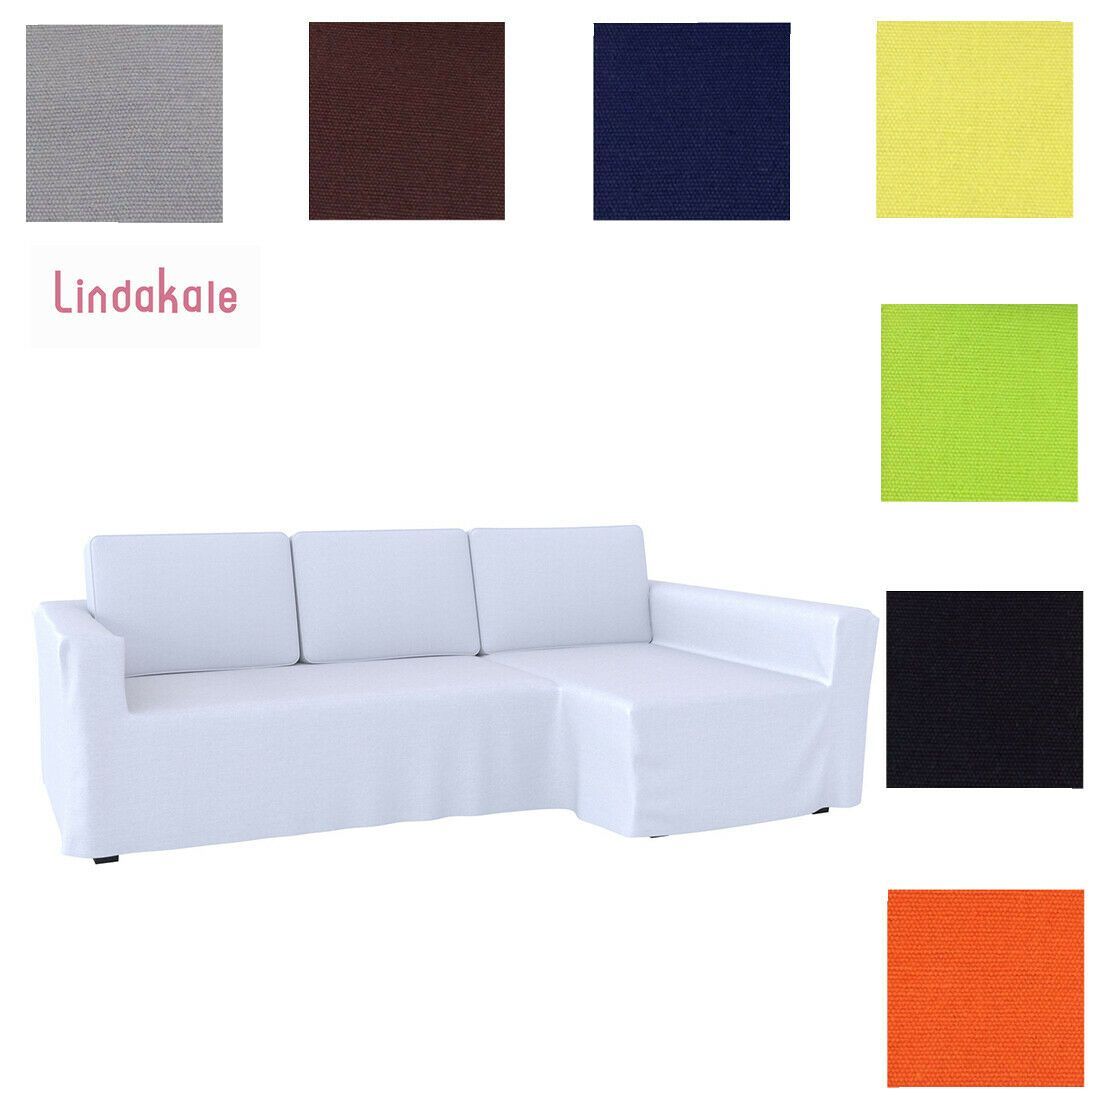 Ikea Manstad Sofa Bed